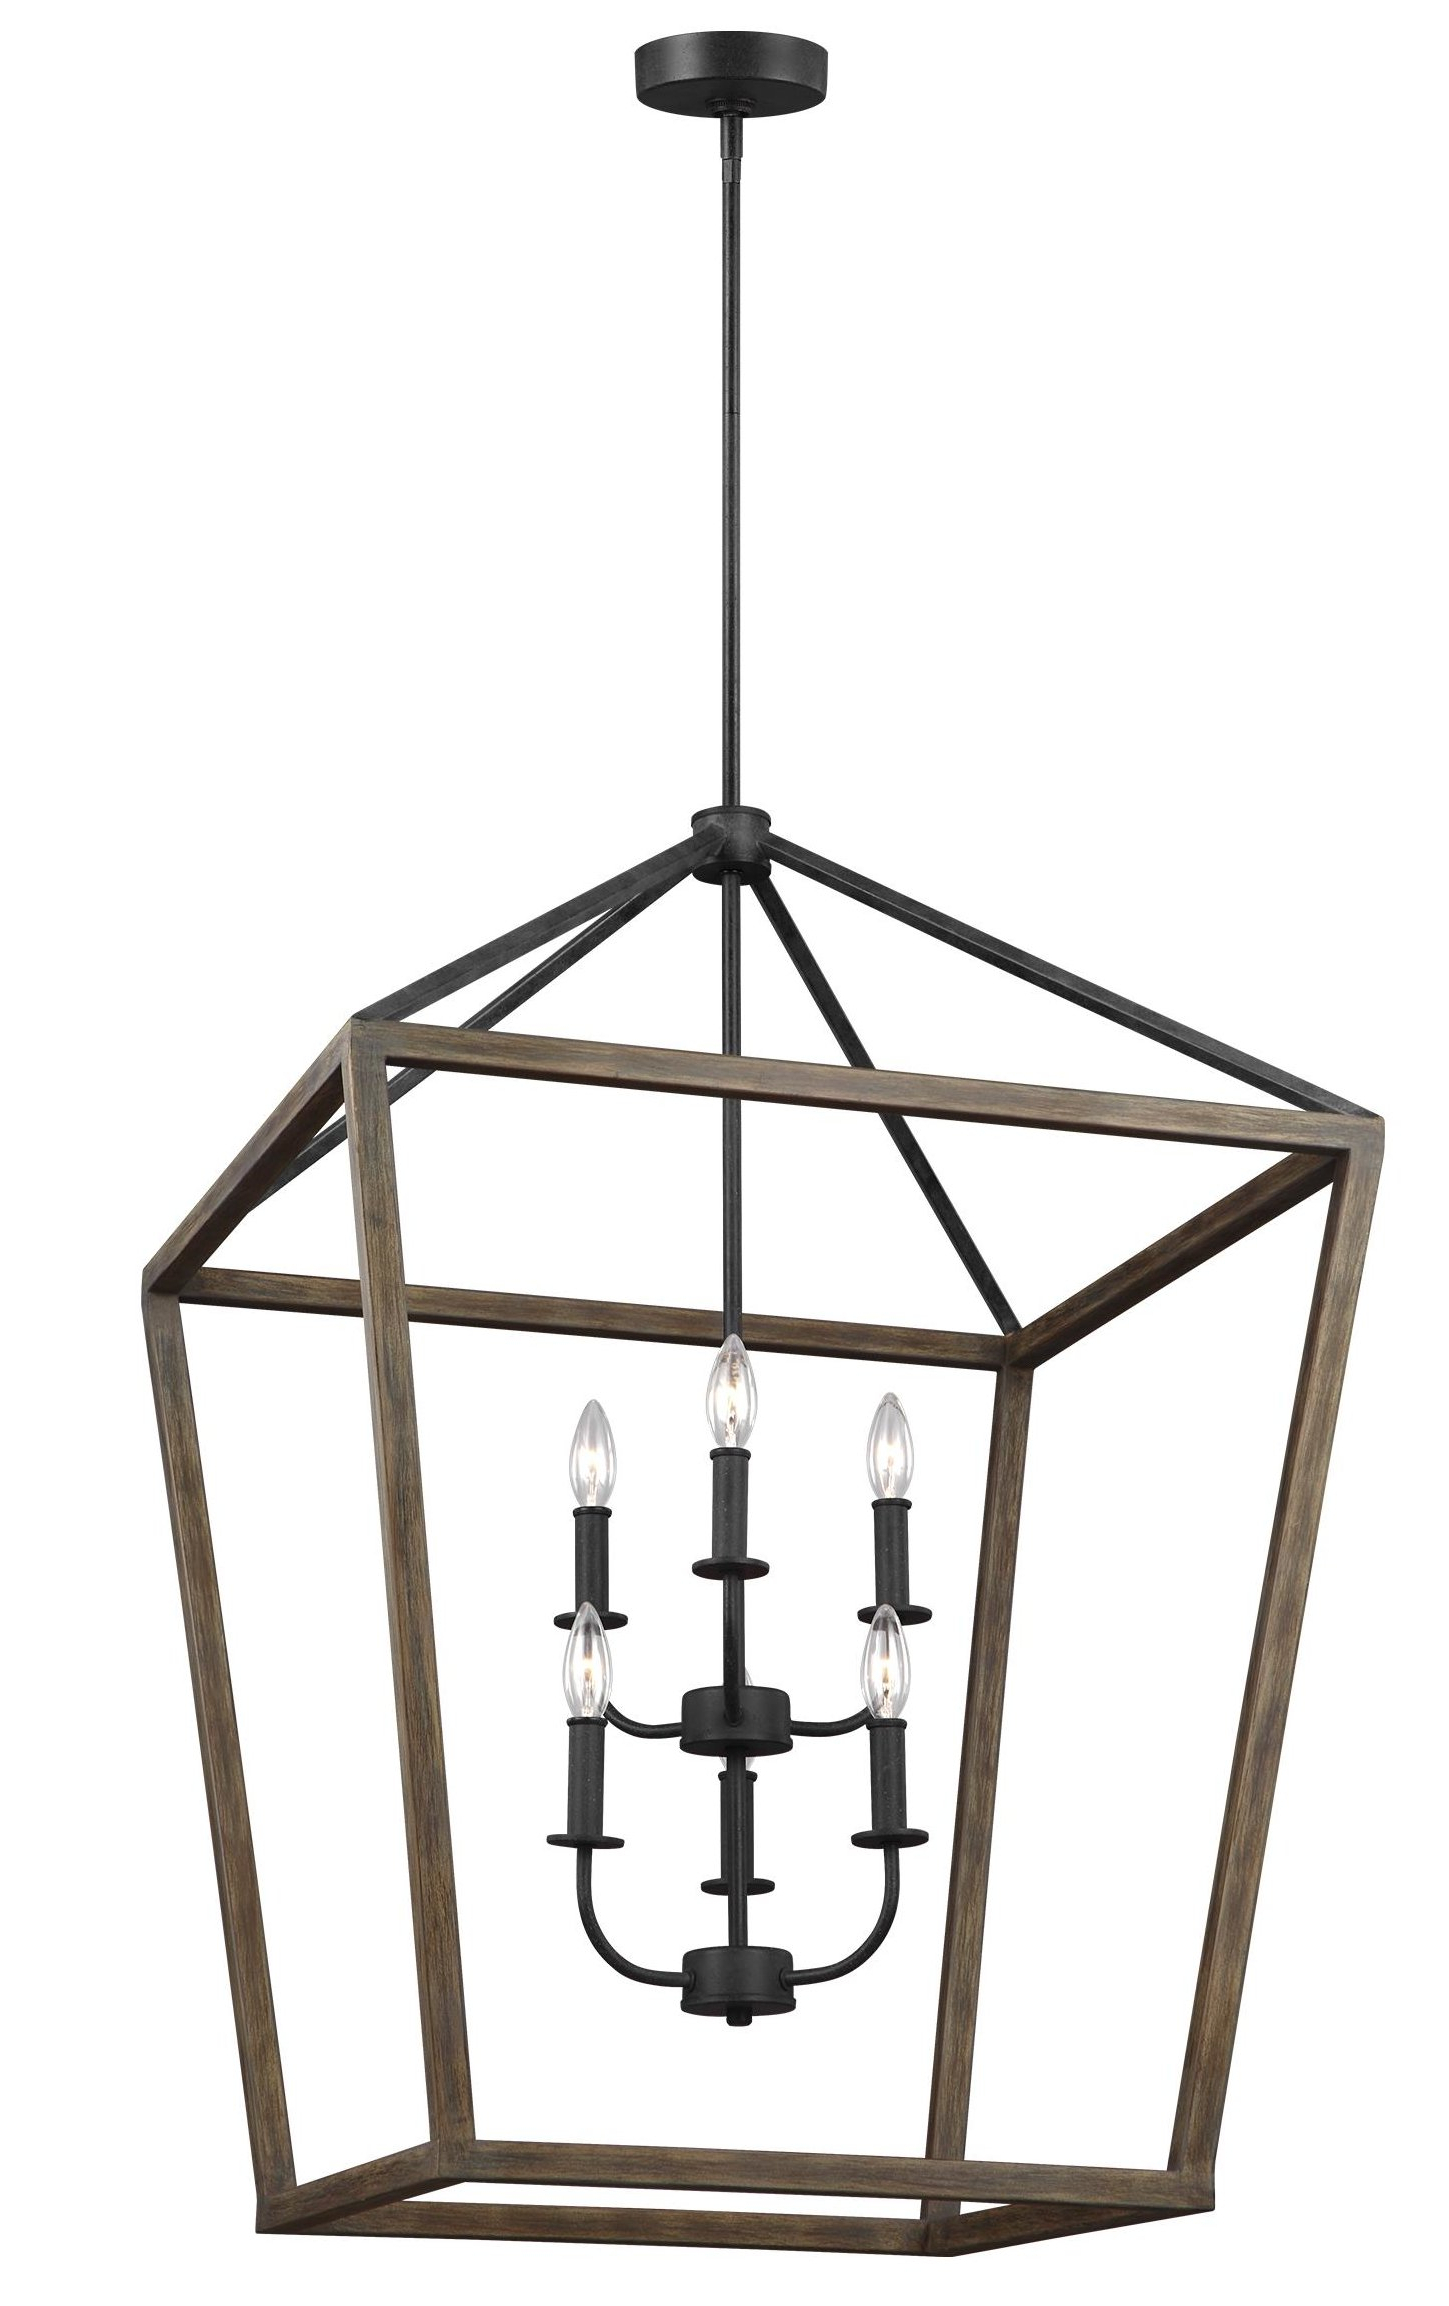 2020 Natarsha 6 Light Lantern Geometric Pendant Regarding Carmen 8 Light Lantern Geometric Pendants (View 1 of 25)